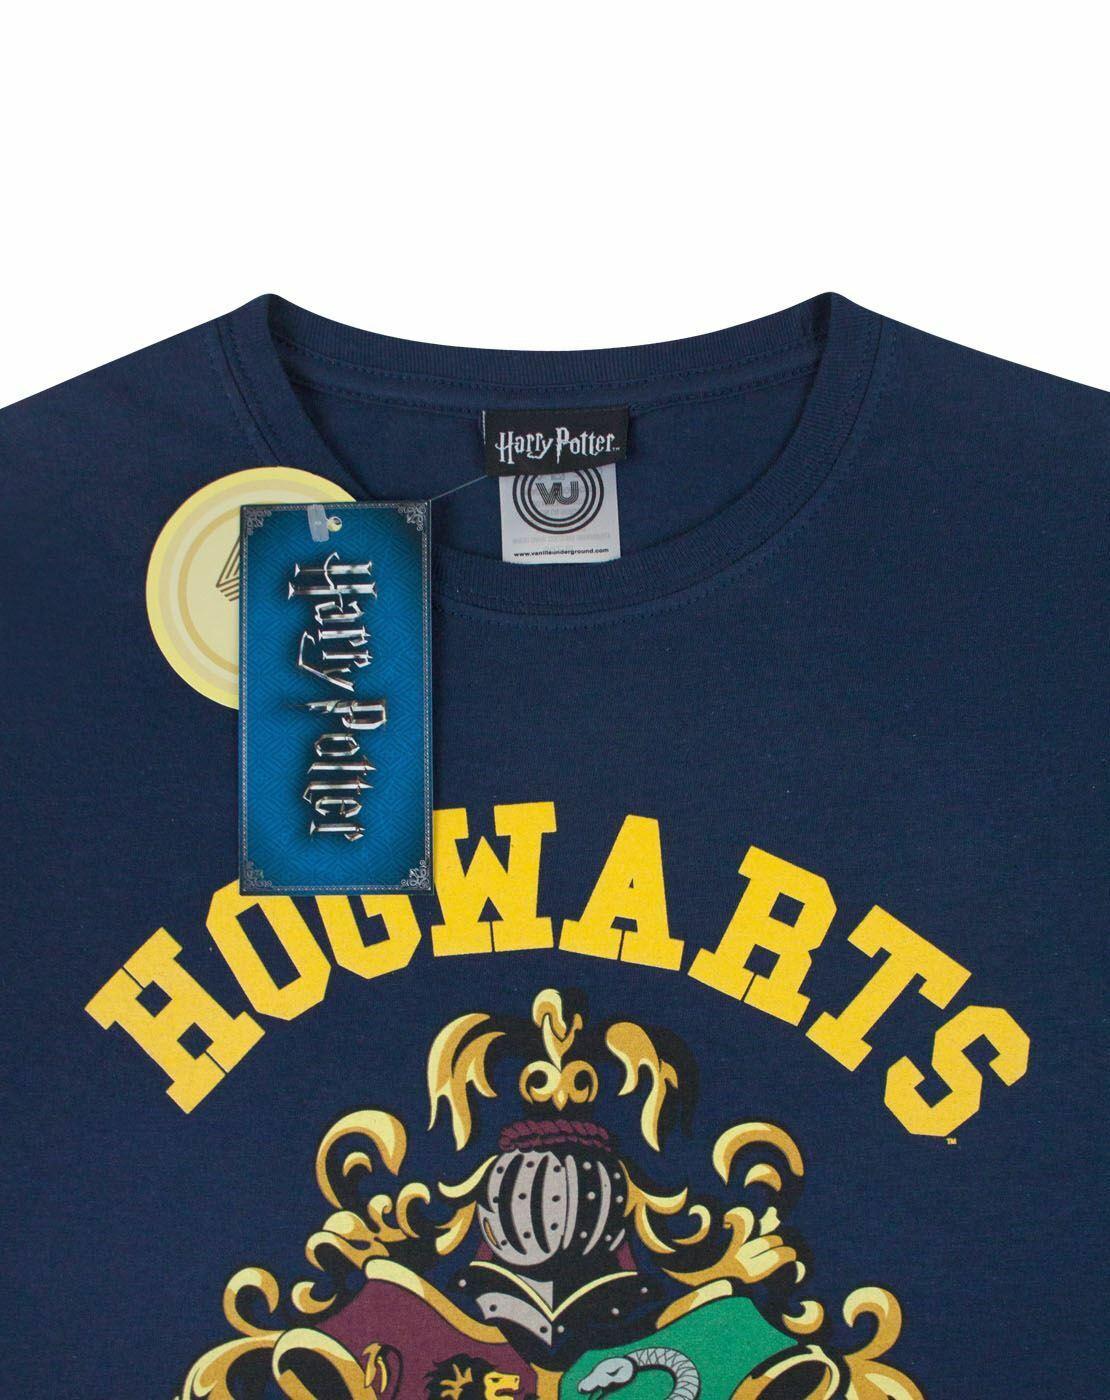 Harry-Potter-Hogwarts-Gryffindor-House-Crest-Women-039-s-Ladies-Navy-T-Shirt-Top thumbnail 9